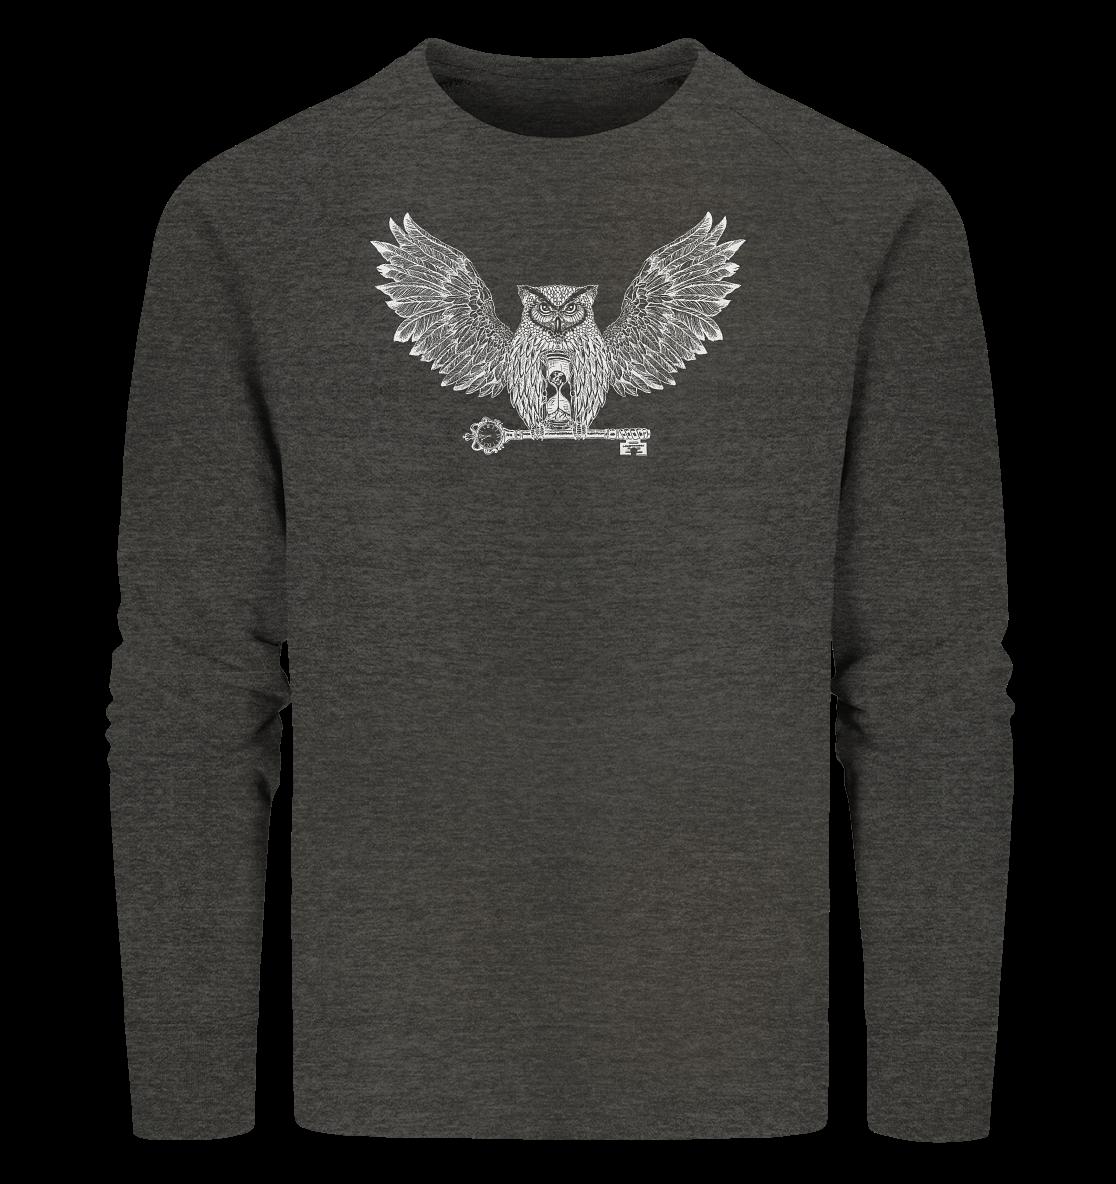 front-organic-sweatshirt-252625-1116x-3.png